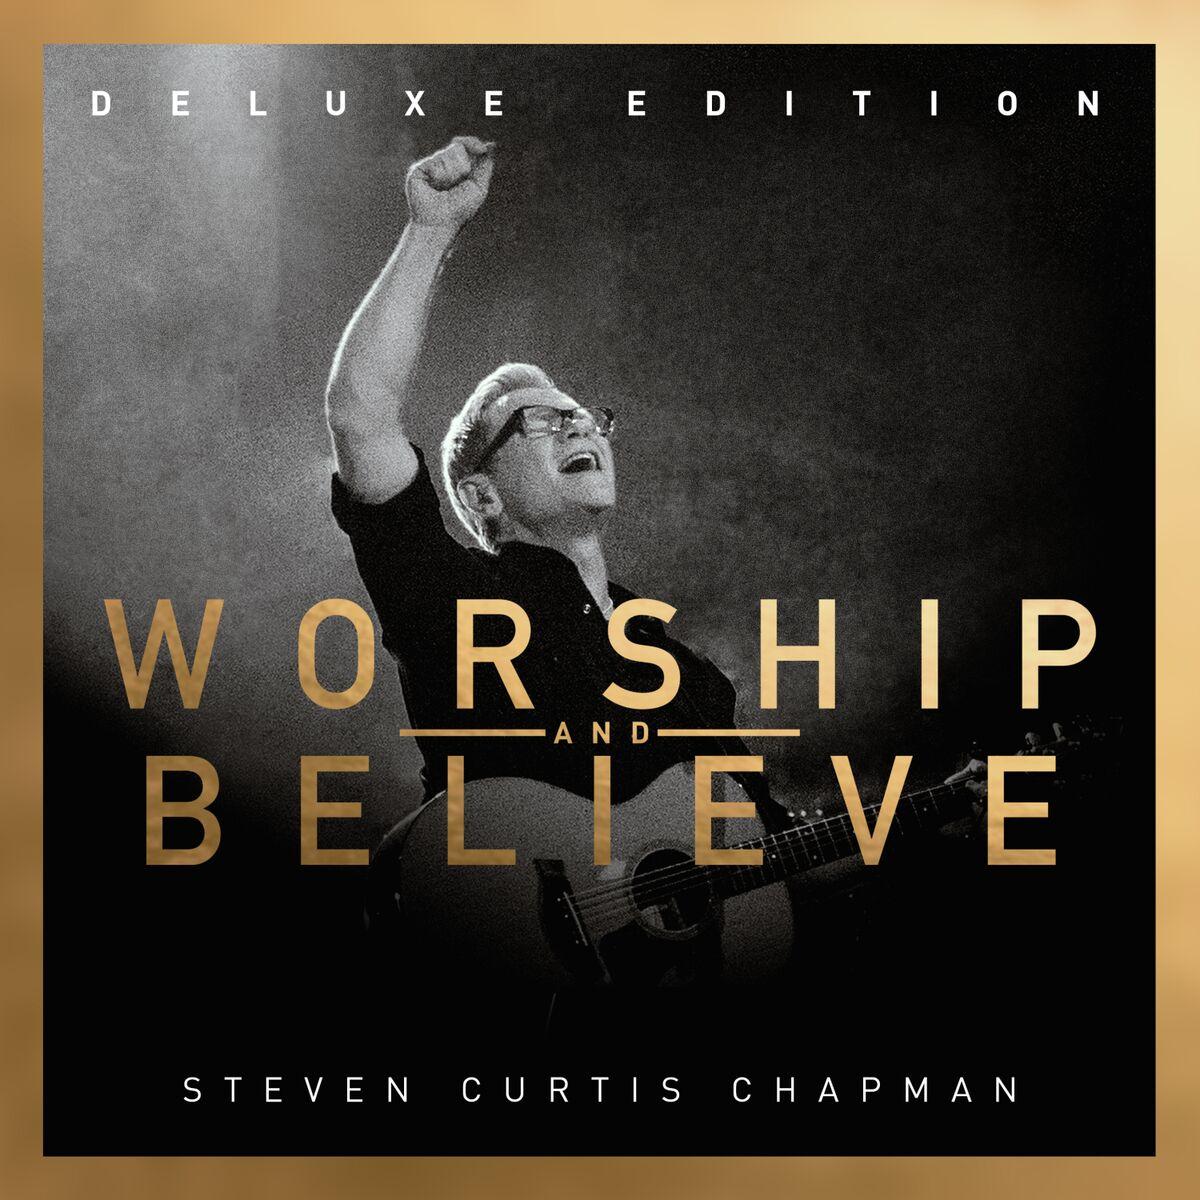 SCC_WorshipAndBelieve_Deluxe_cvr-hi_preview